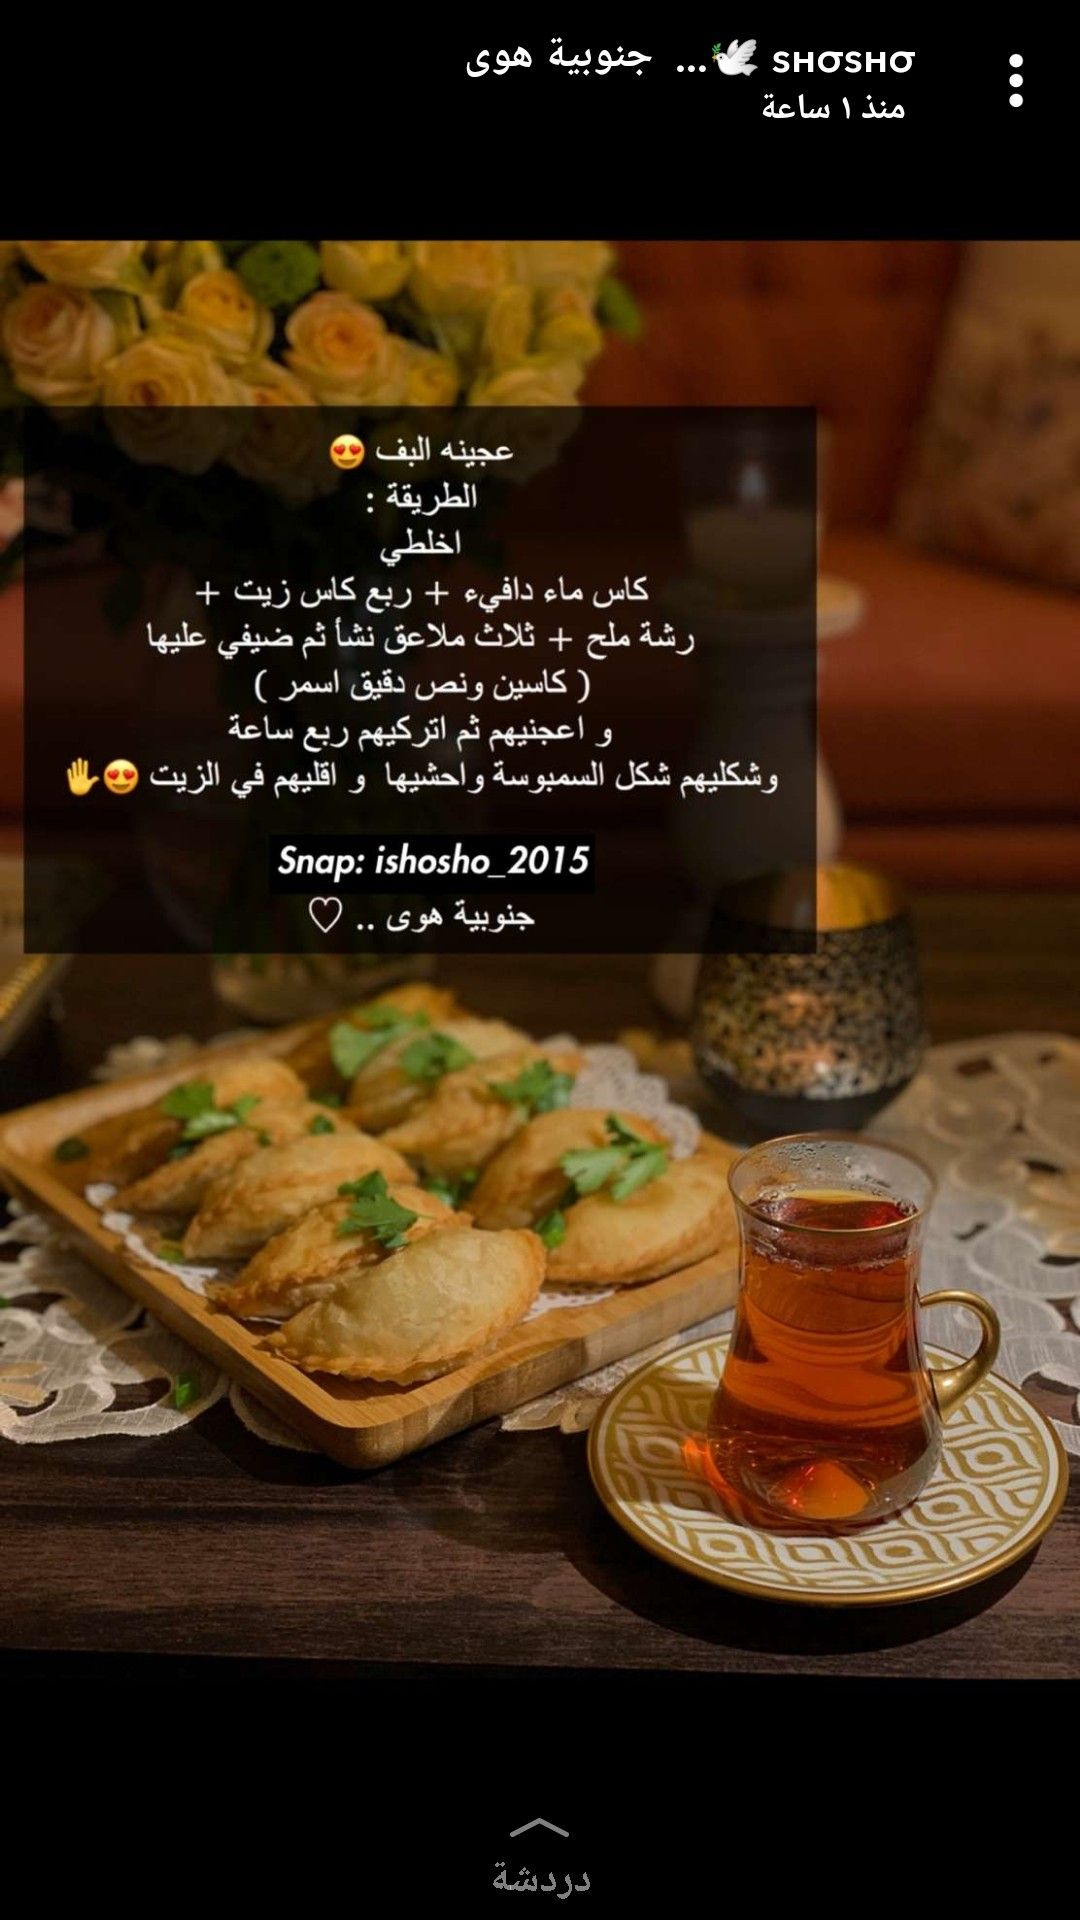 Pin By Lollly On Yummy In 2021 Food Receipes Food Recipies Ramadan Recipes